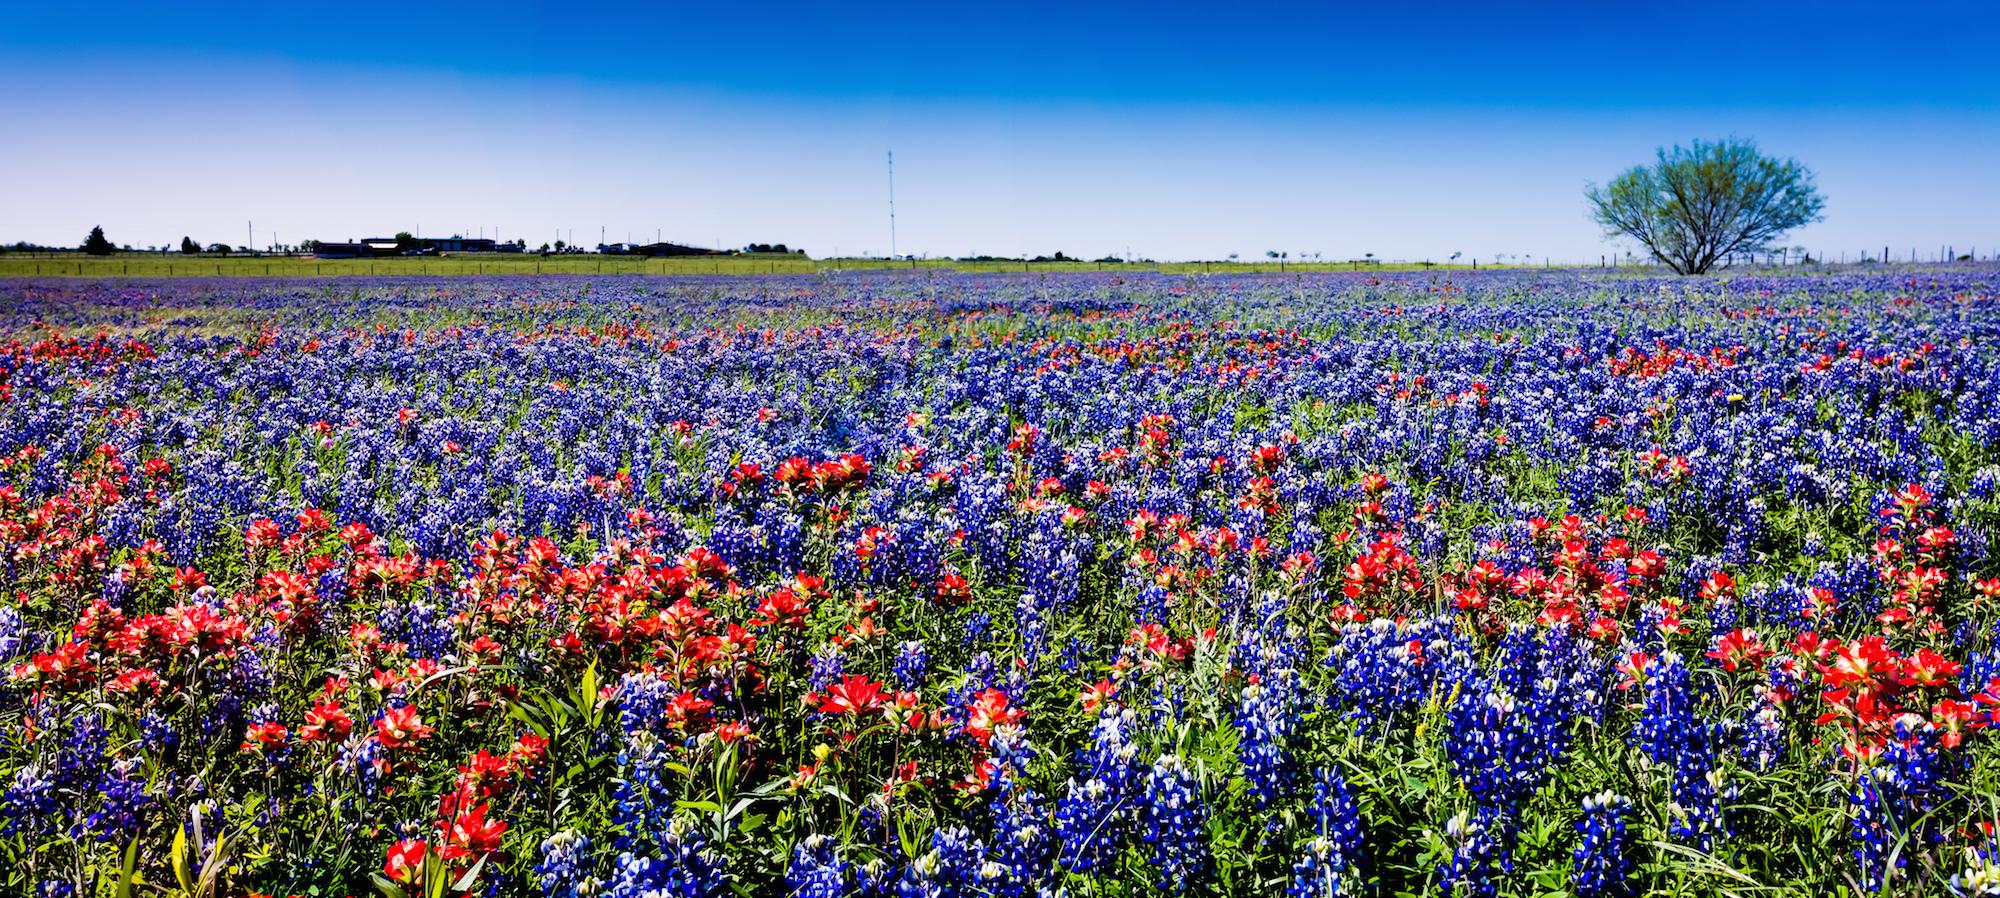 bluebonnet_Indian_paintbrush_flowers_Texas